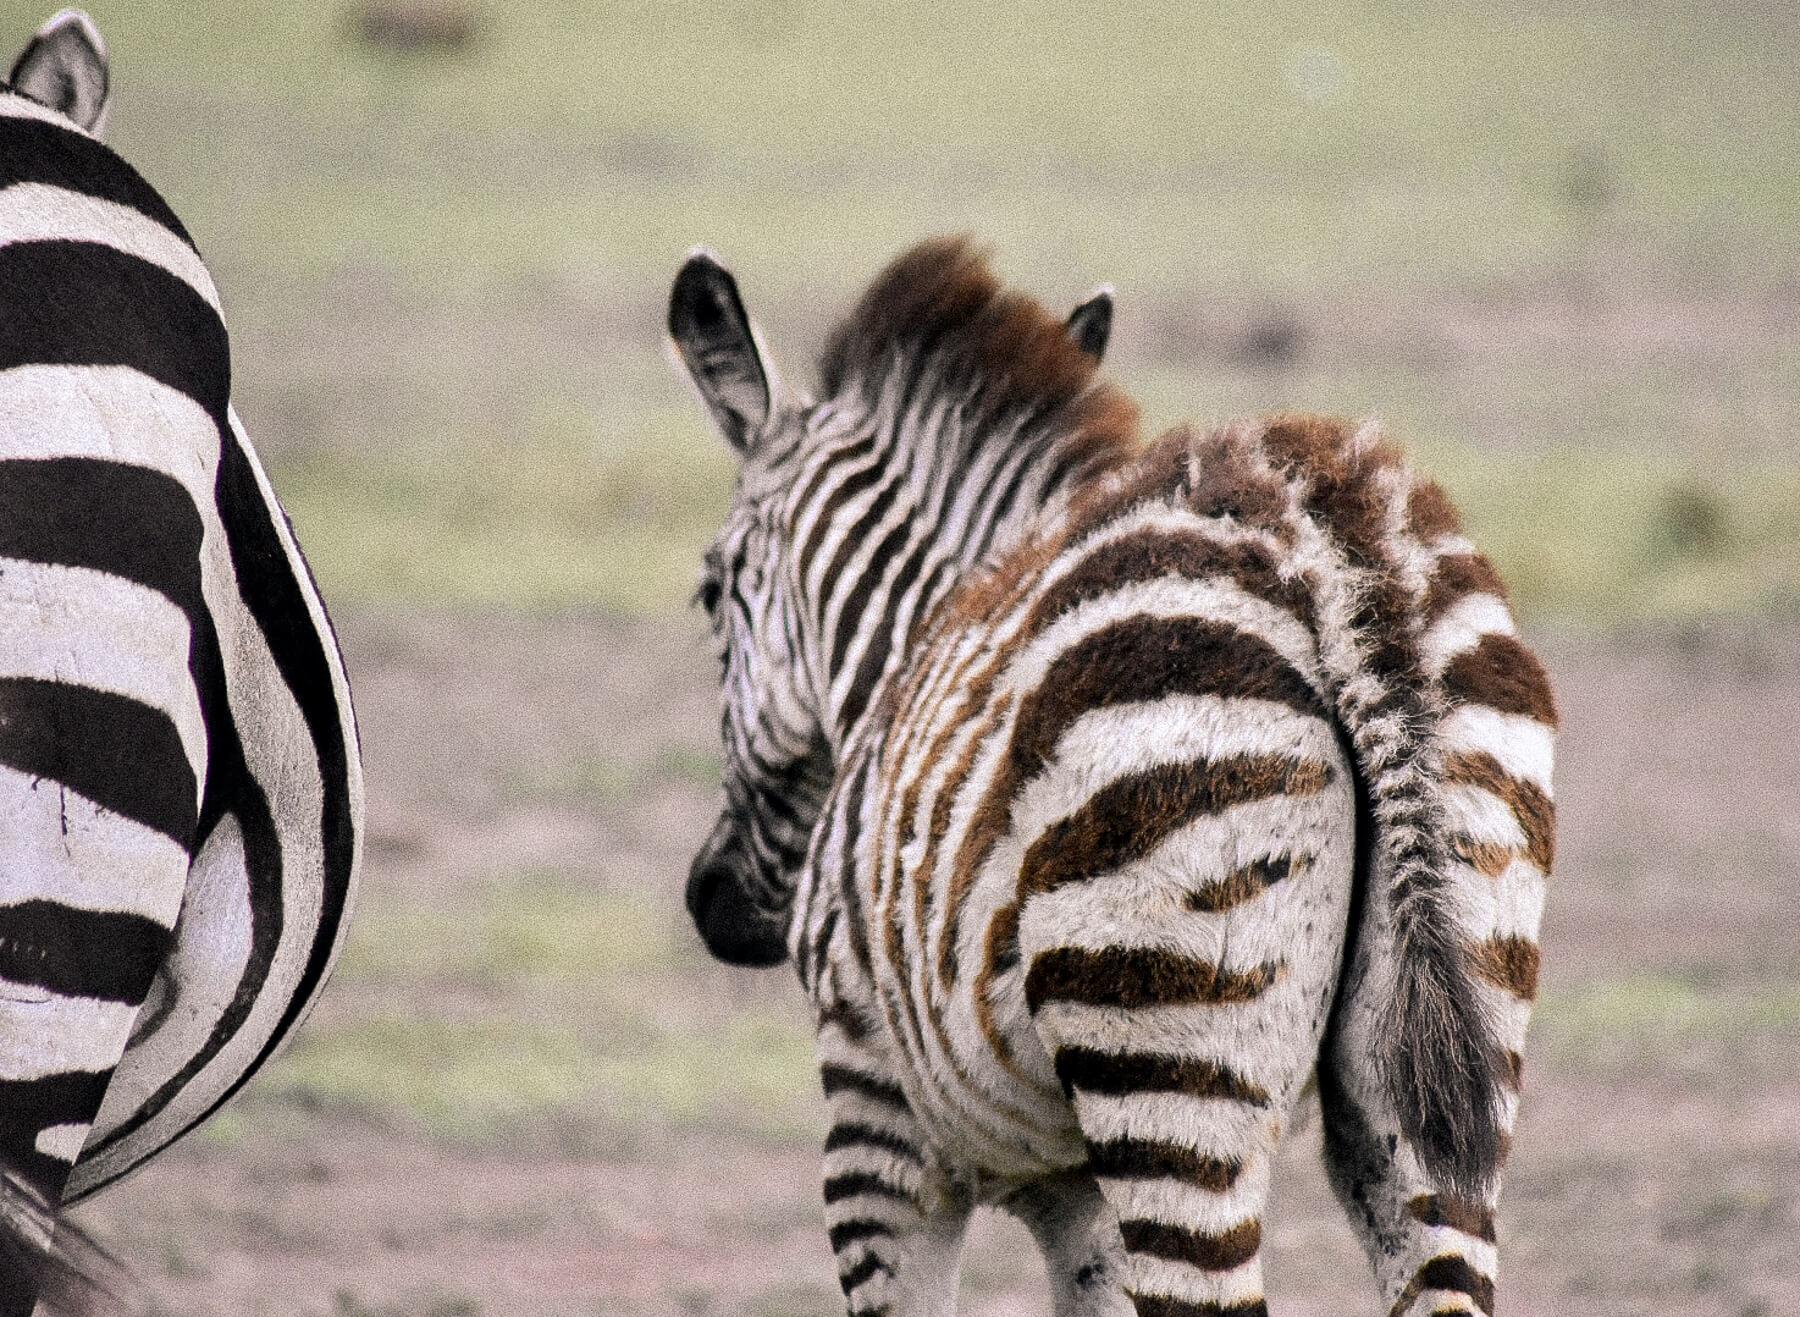 A fluffy baby zebra walking away from the camera in the Maasai Mara